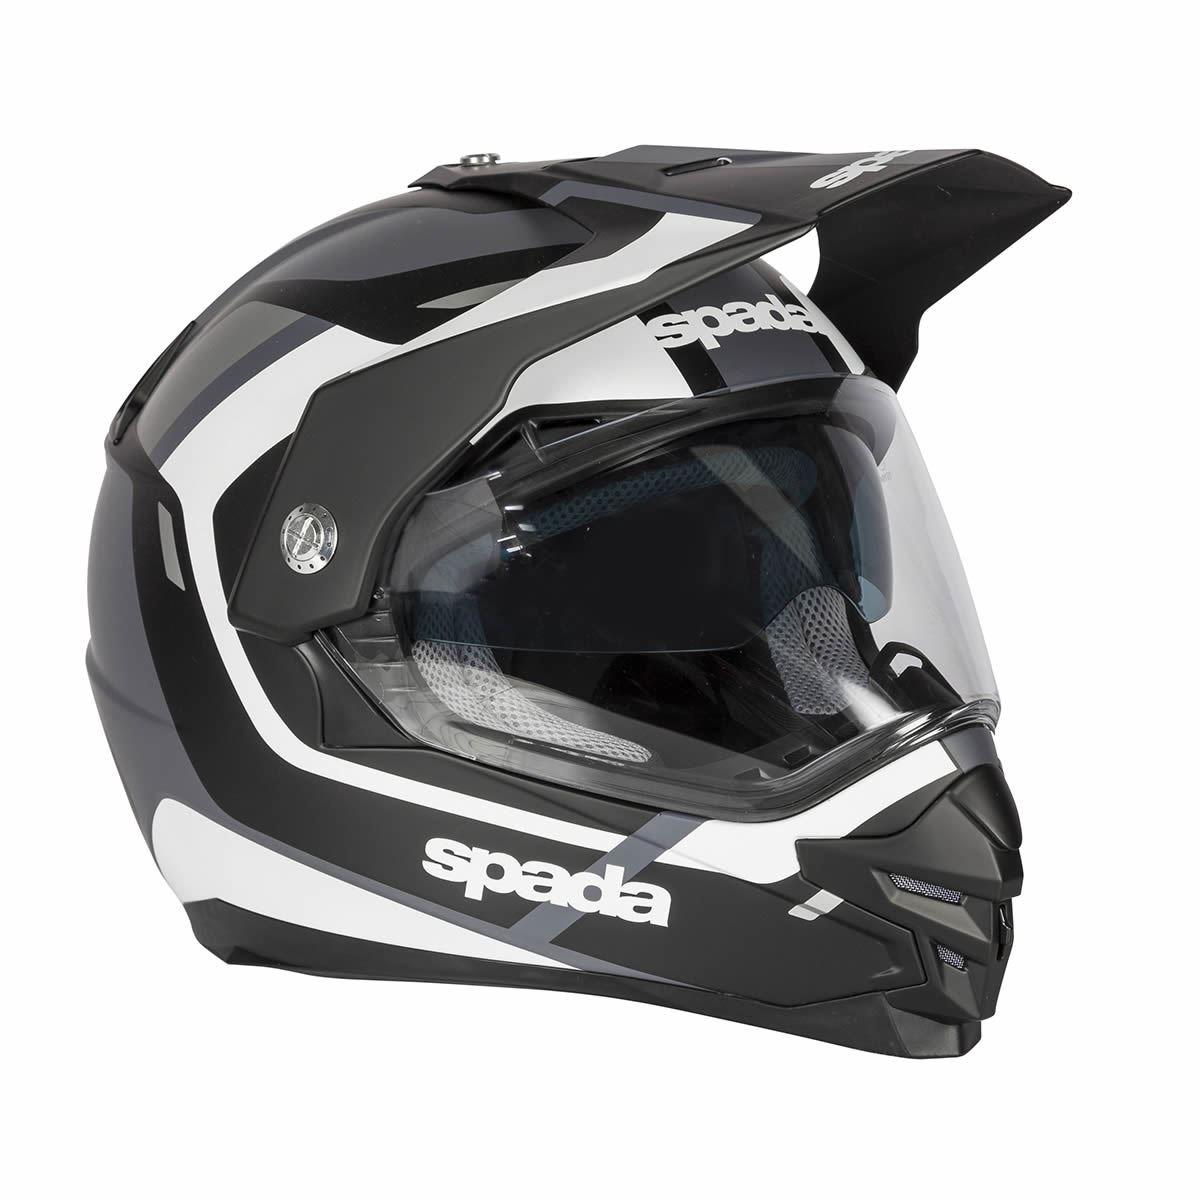 Spada-Intrepid-Full-Face-Motorcycle-Off-Road-Adventure-Style-Helmet-Sun-Visor thumbnail 15